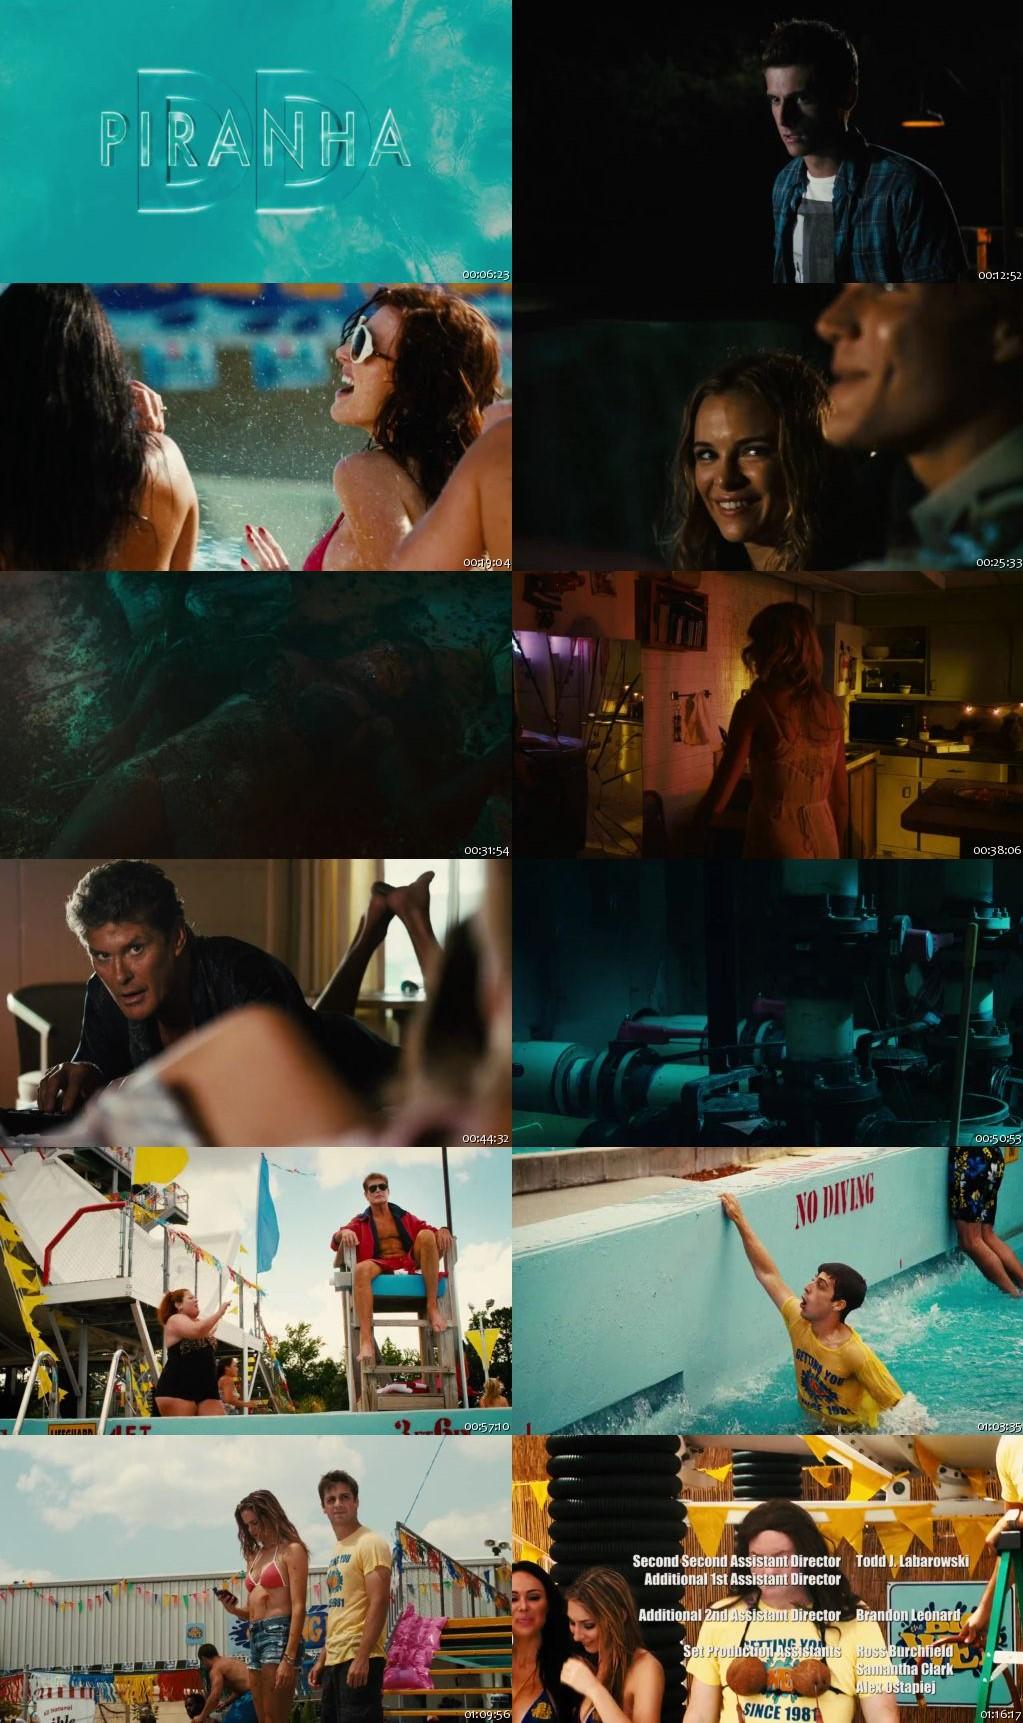 Piranha 3DD 2012 Full Movie Online Watch BRRip 720p Dual Audio